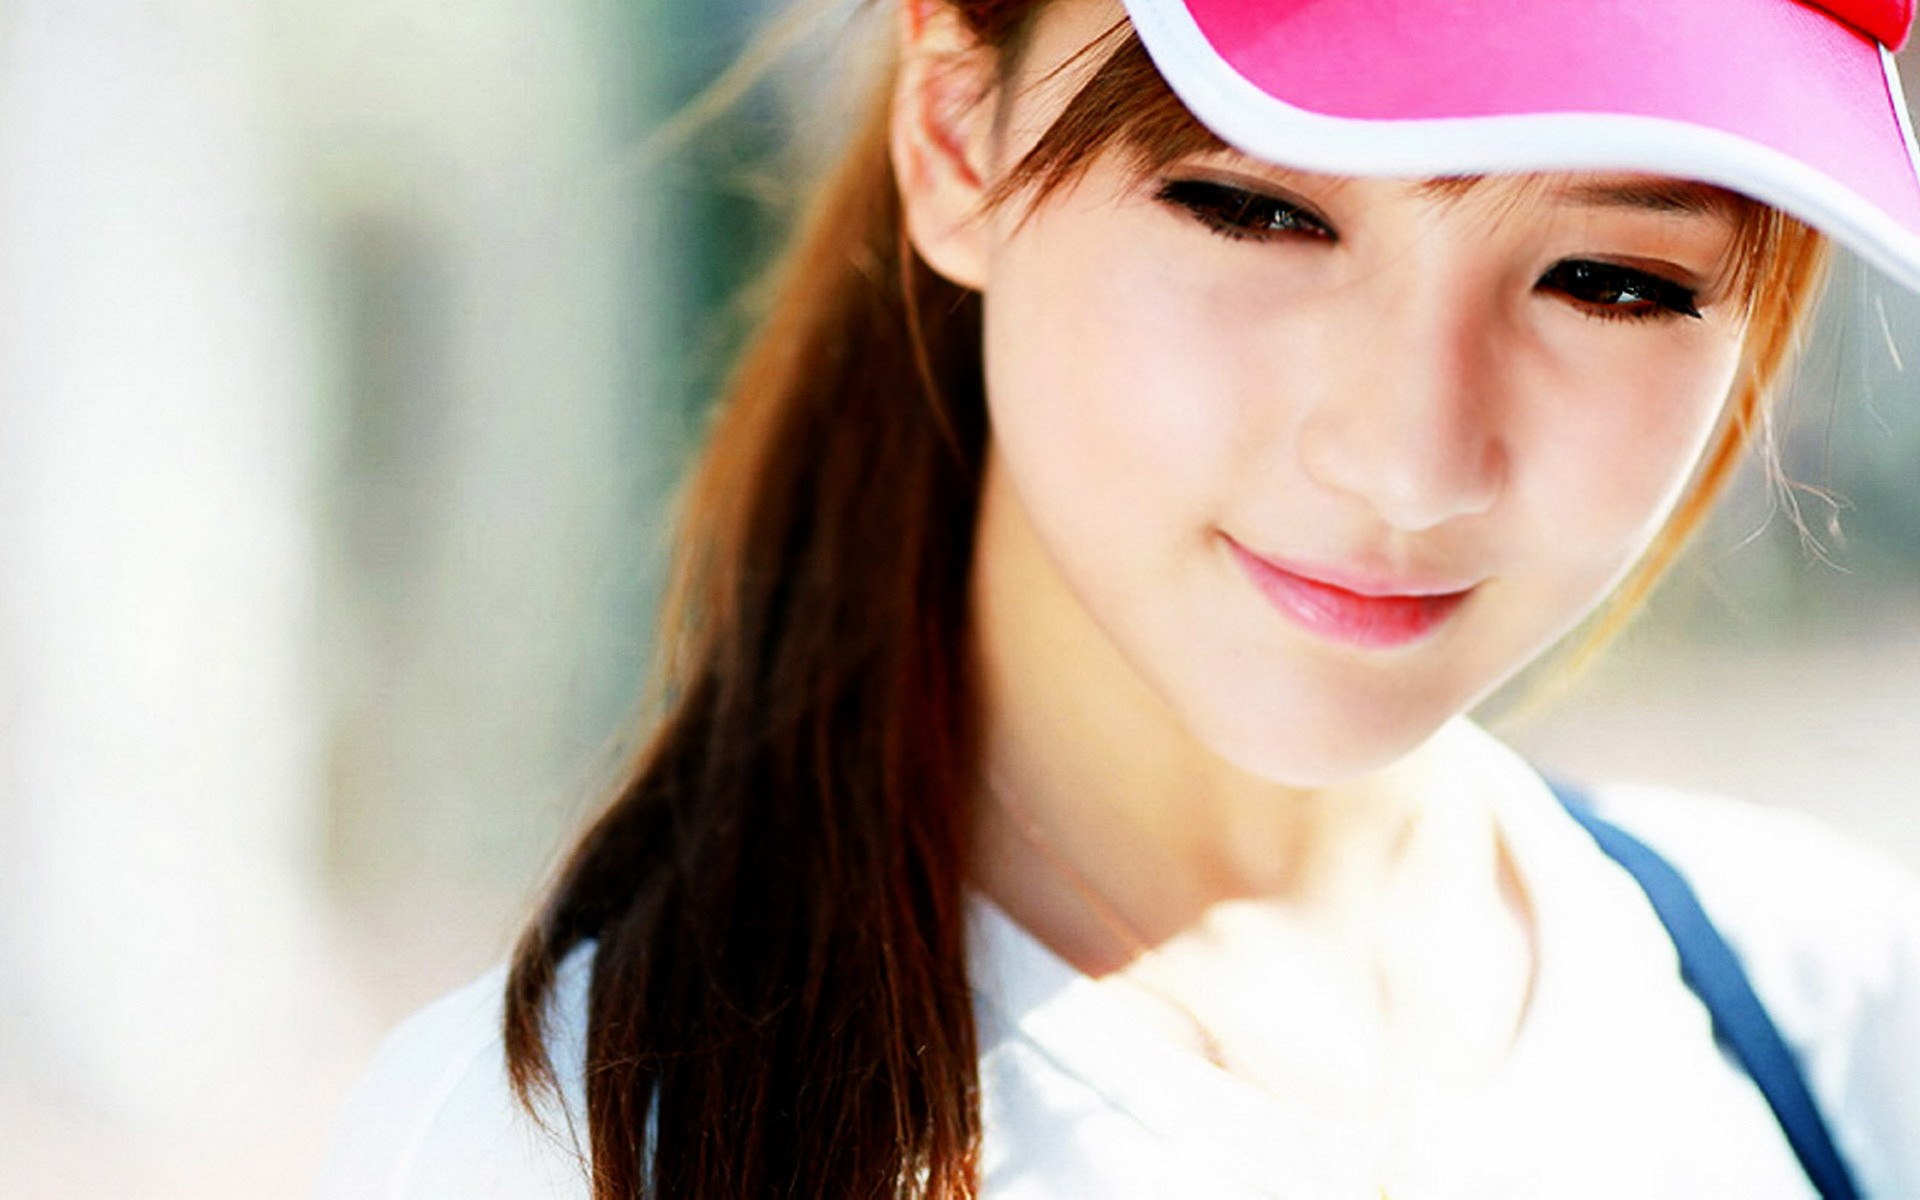 Cute Asian Girl Wallpaper HD Wallpupcom 1920x1200